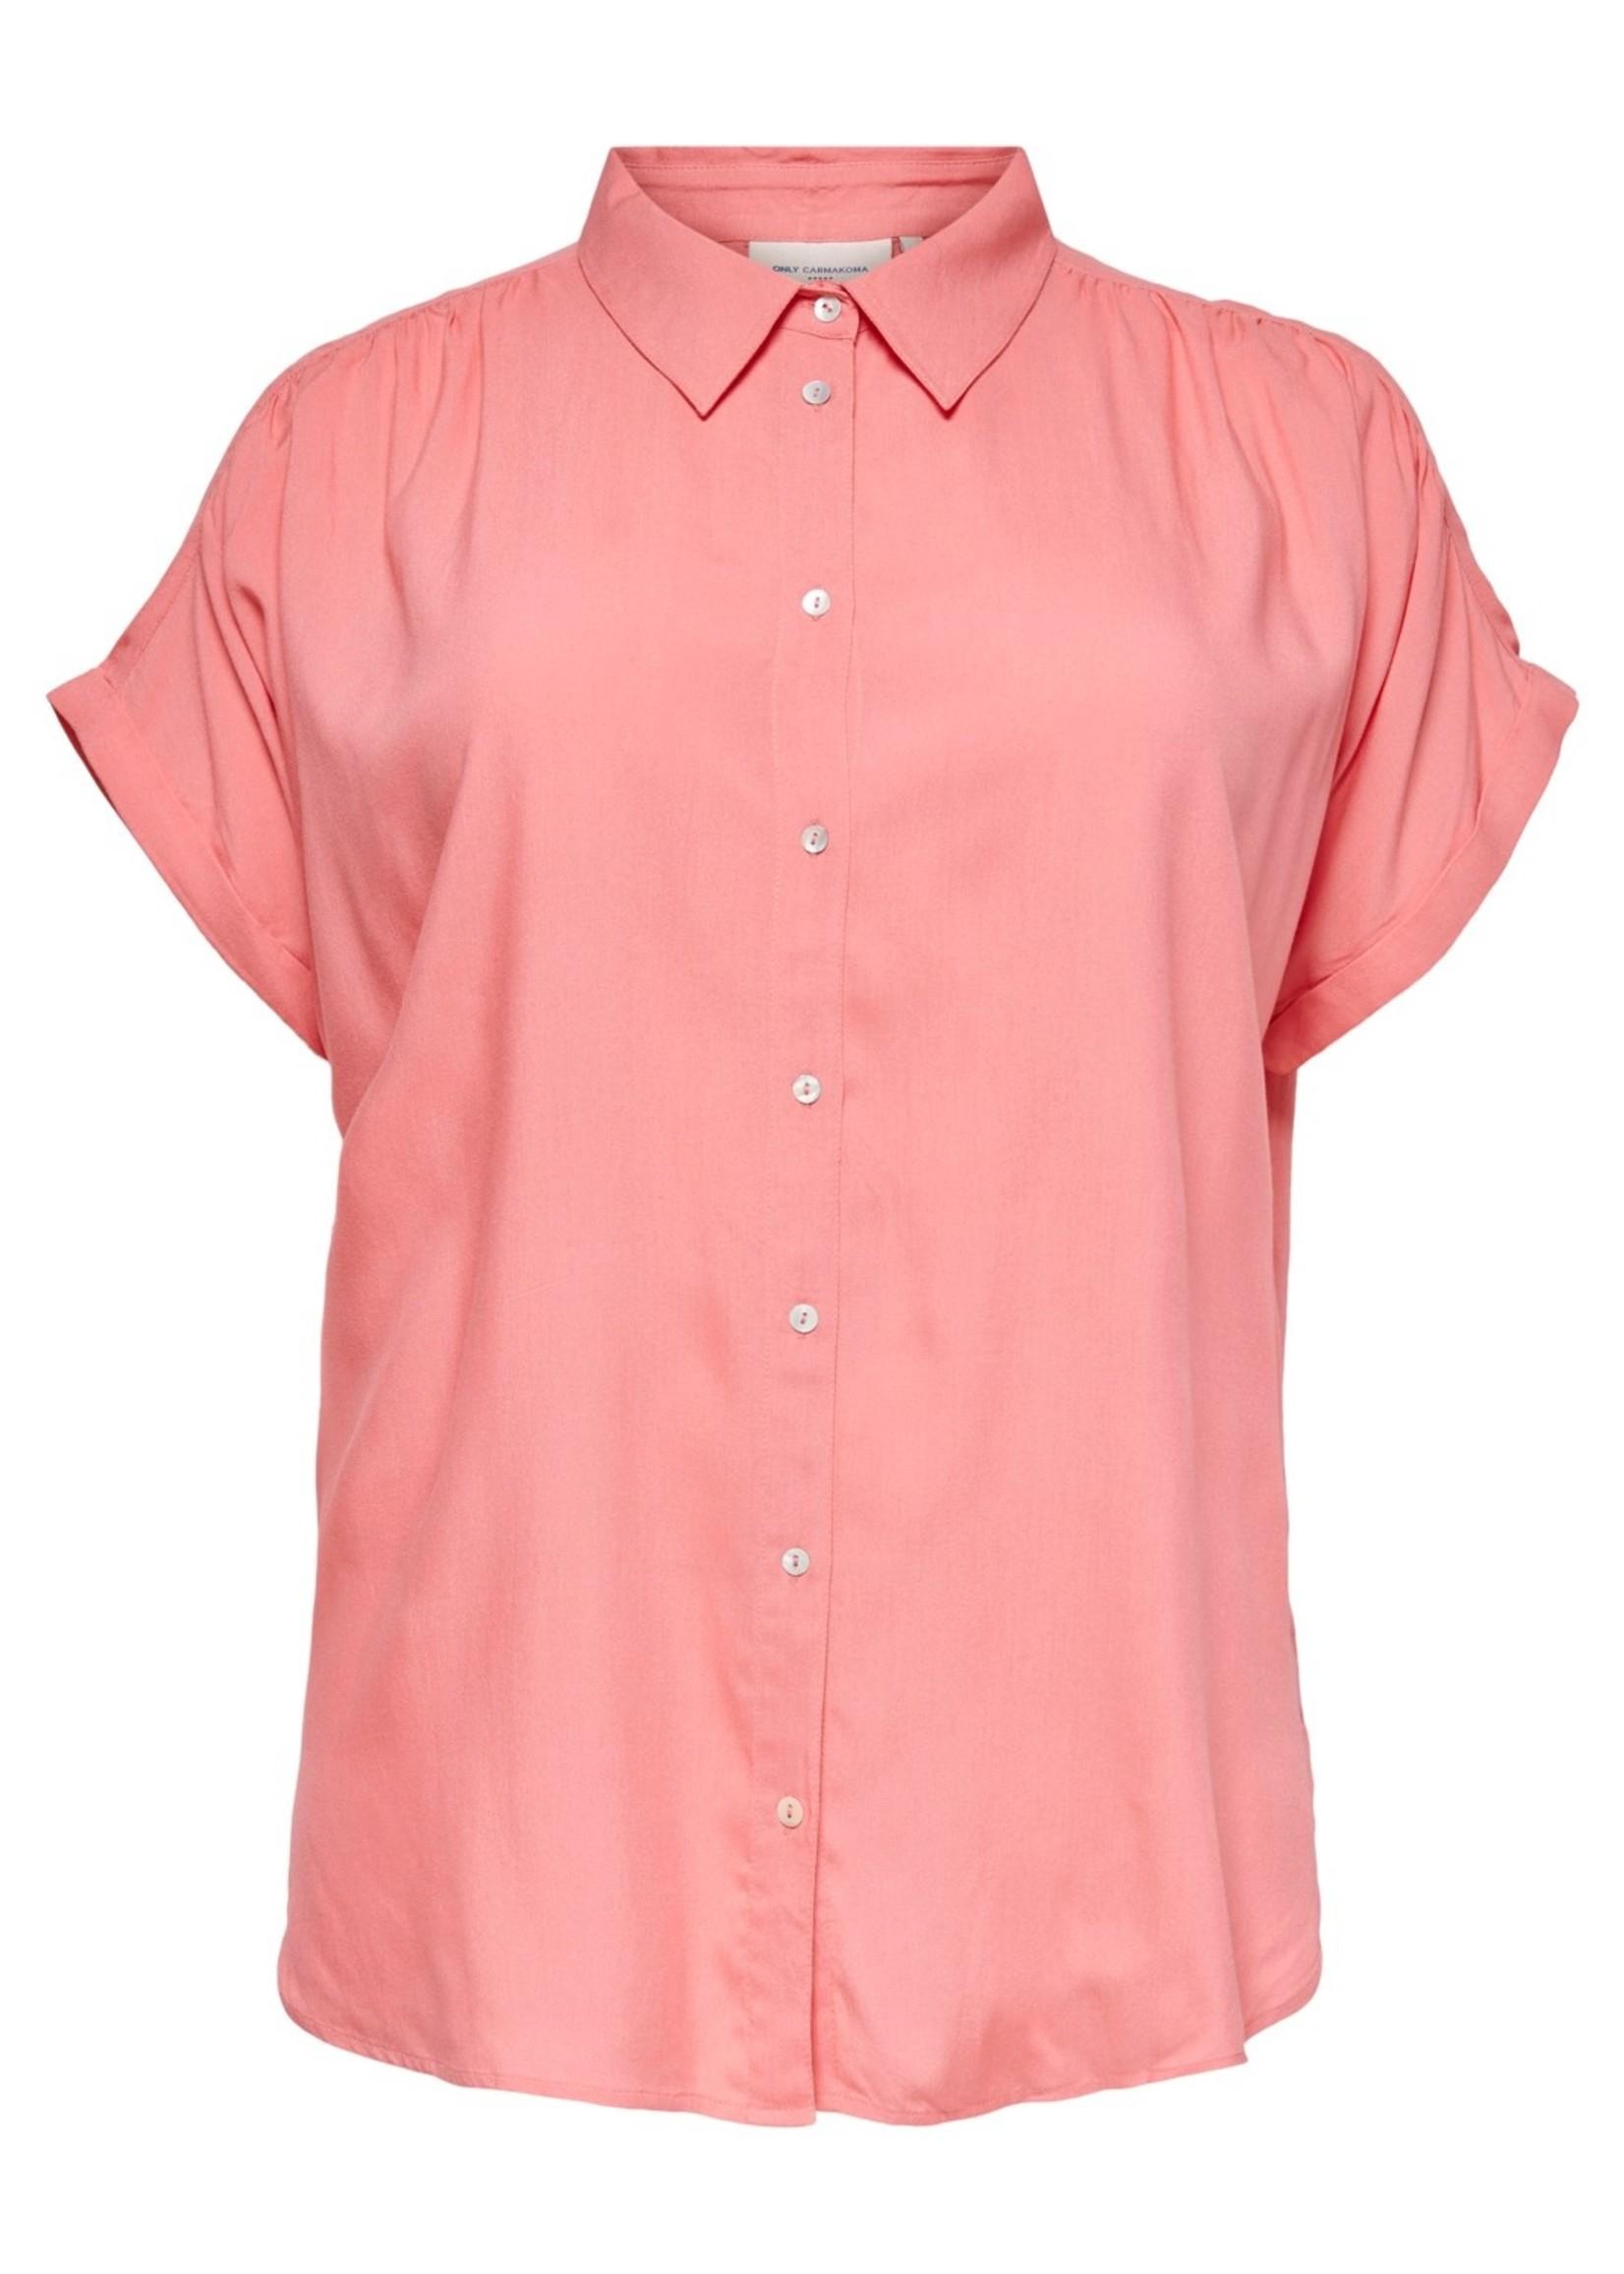 Only Carmakoma Only Carmakoma Marok Shirt